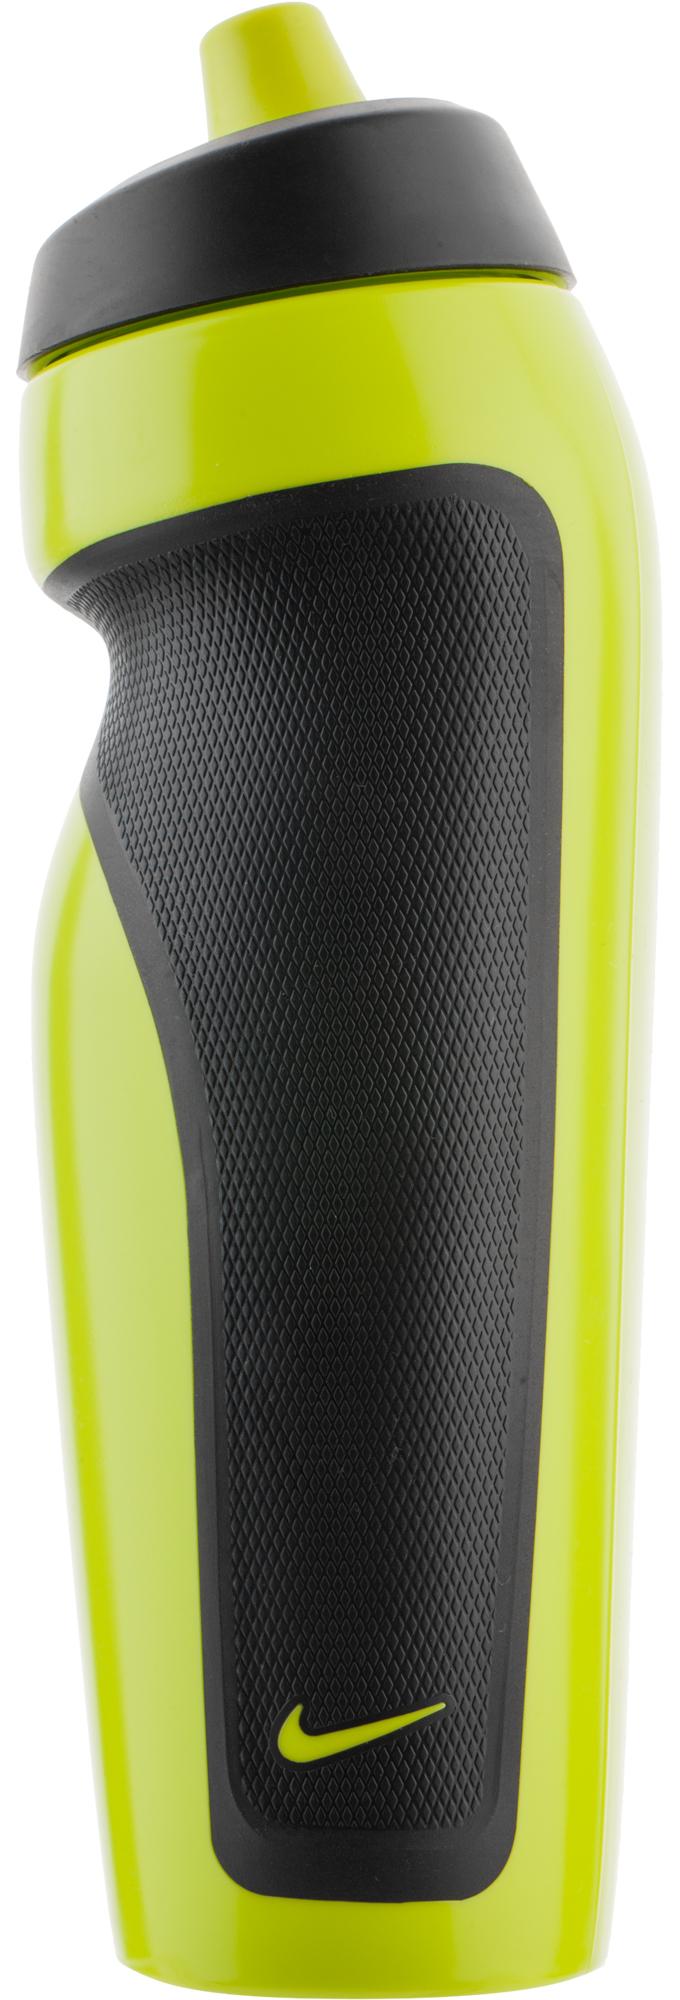 Nike Бутылка для воды Accessories, зеленая